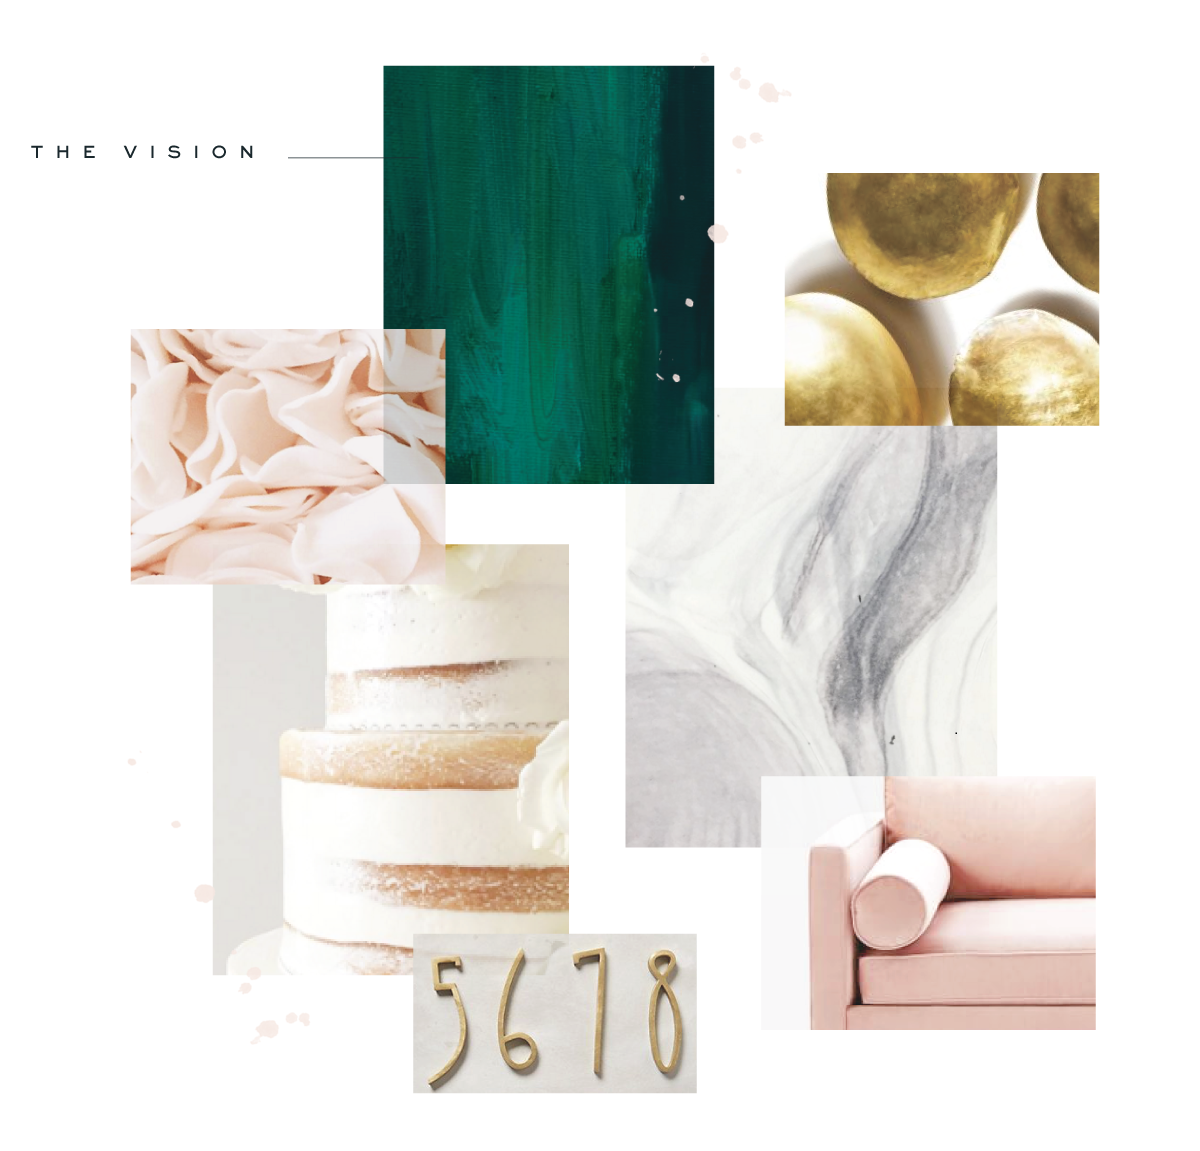 Modern Brand and Website Design - Modern Calligraphy Logo - Saffron Avenue - Brand Board, Inspiration Board, Modern Logo Design, Website Design, Website Layout